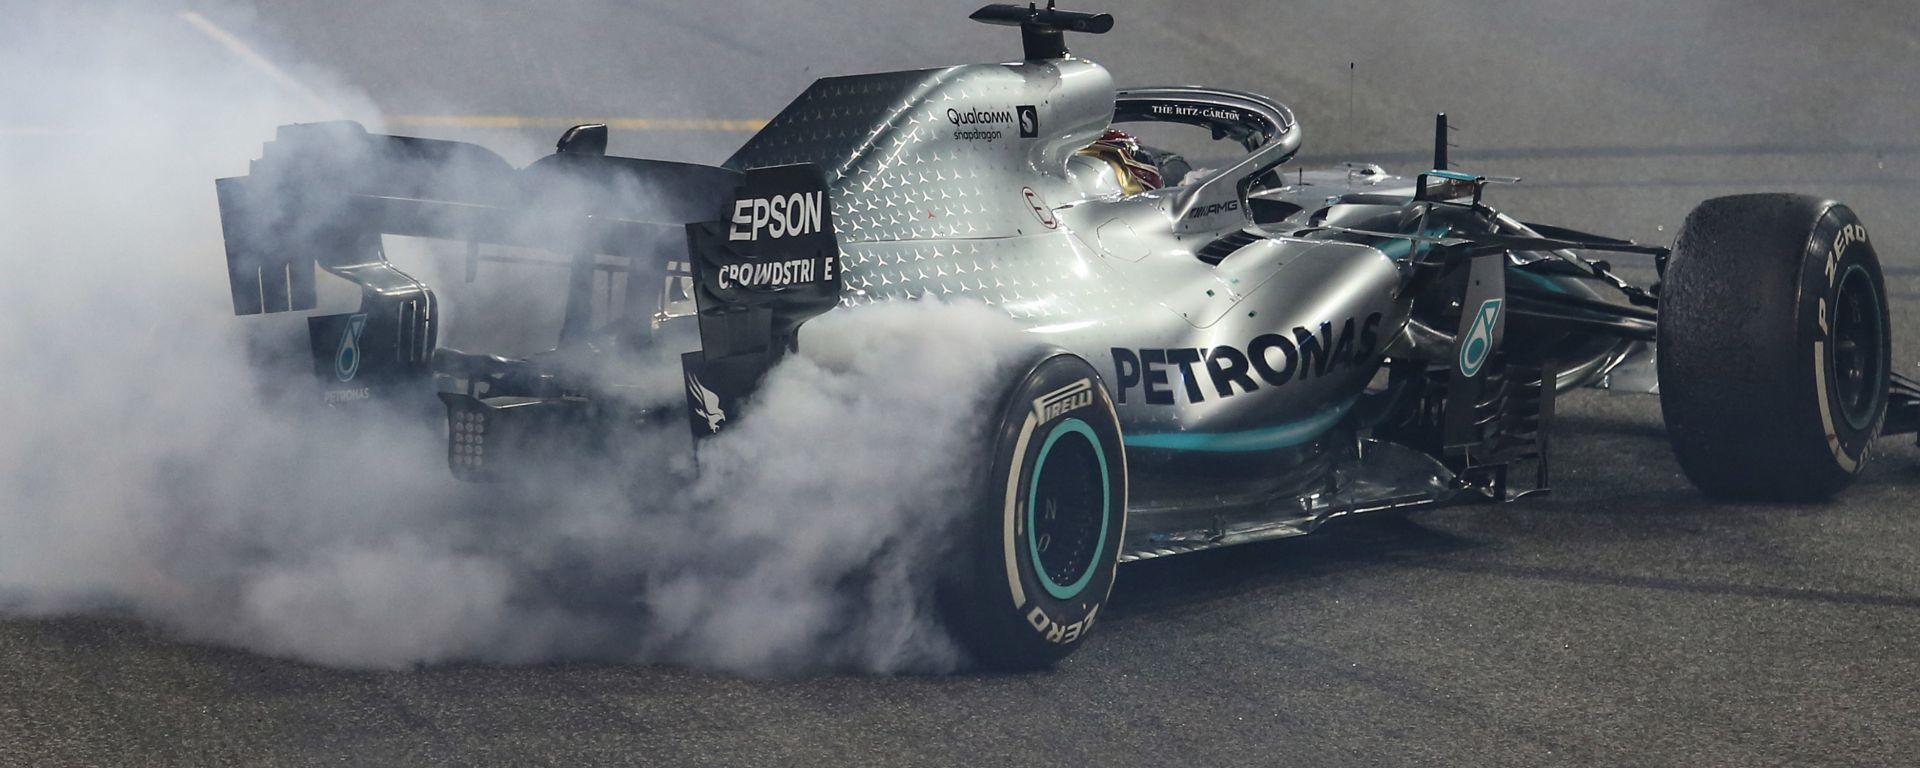 F1 GP Abu Dhabi 2019, Yas Marina: Lewis Hamilton (Mercedes) festeggia la vittoria con i donuts